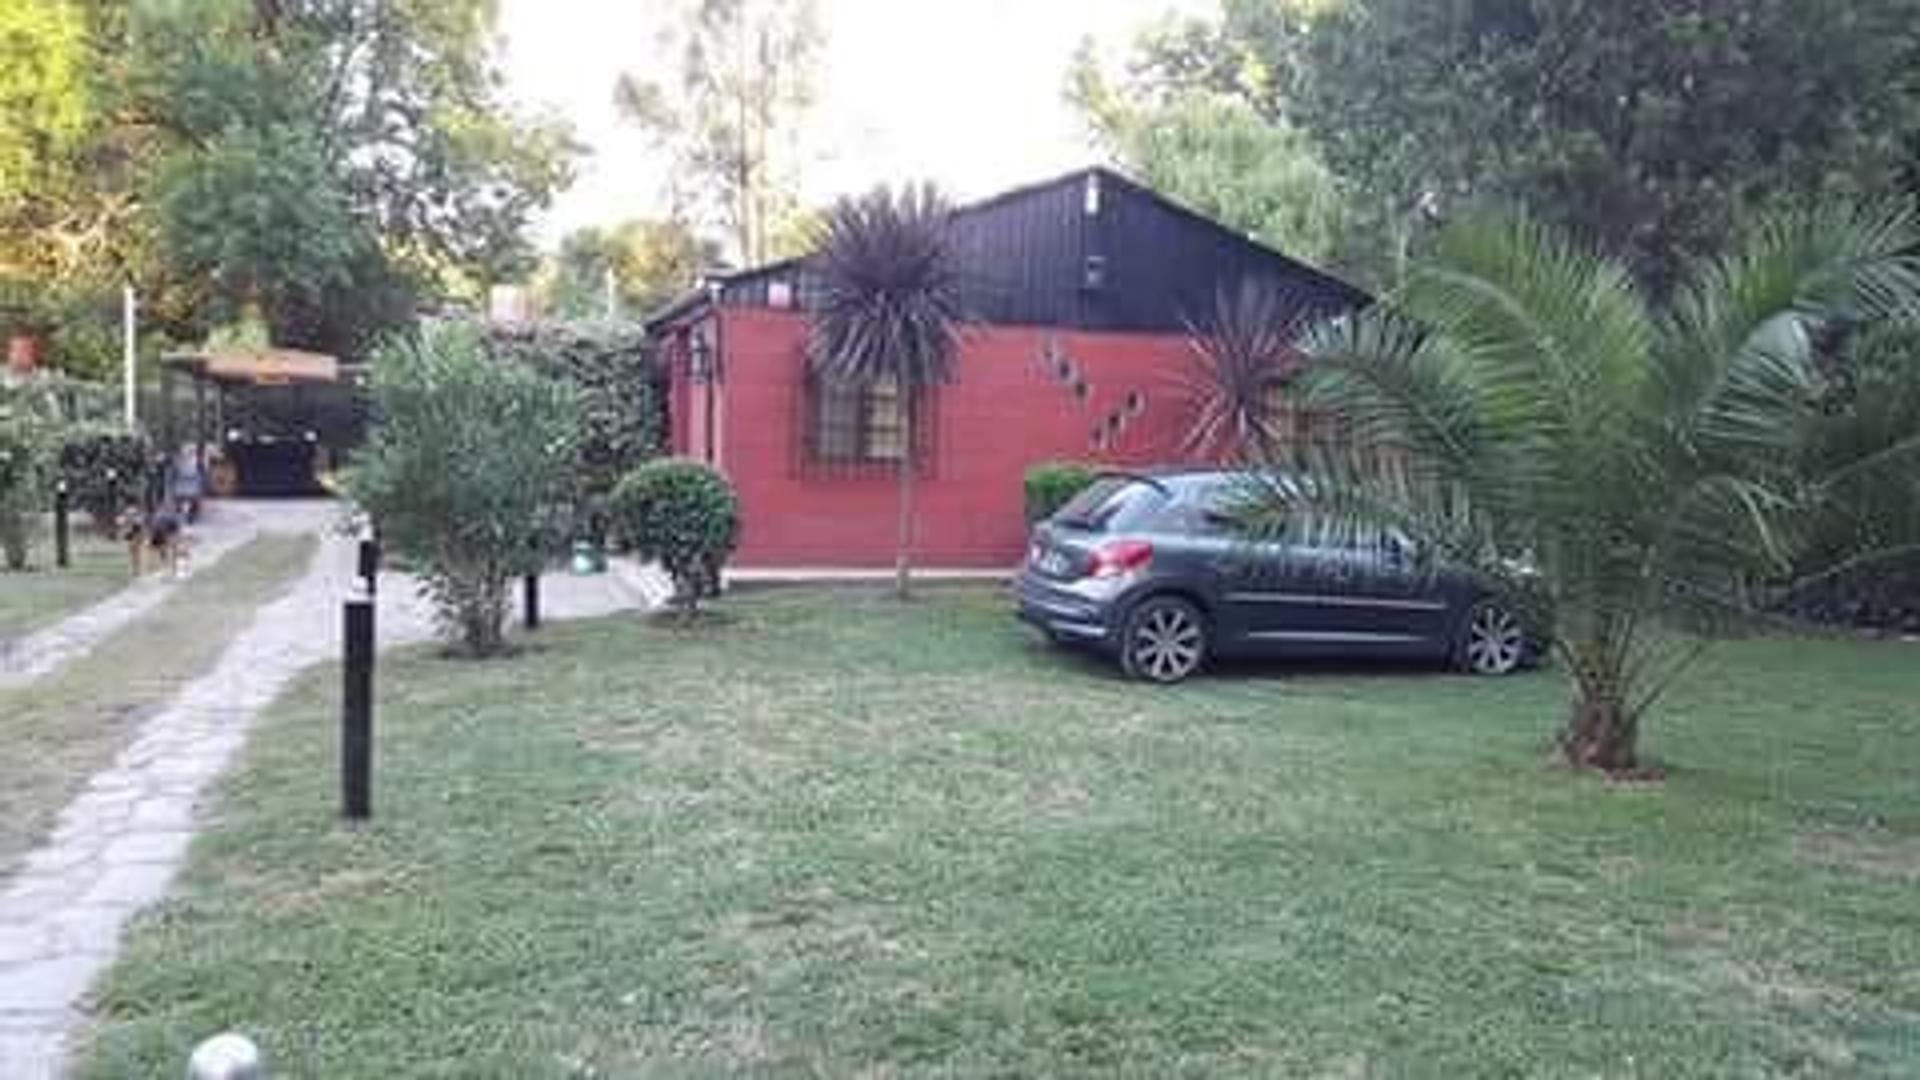 Venta Casa Quinta, Pilar, La Lonja, 1600 m2, Posibilidad de Permuta